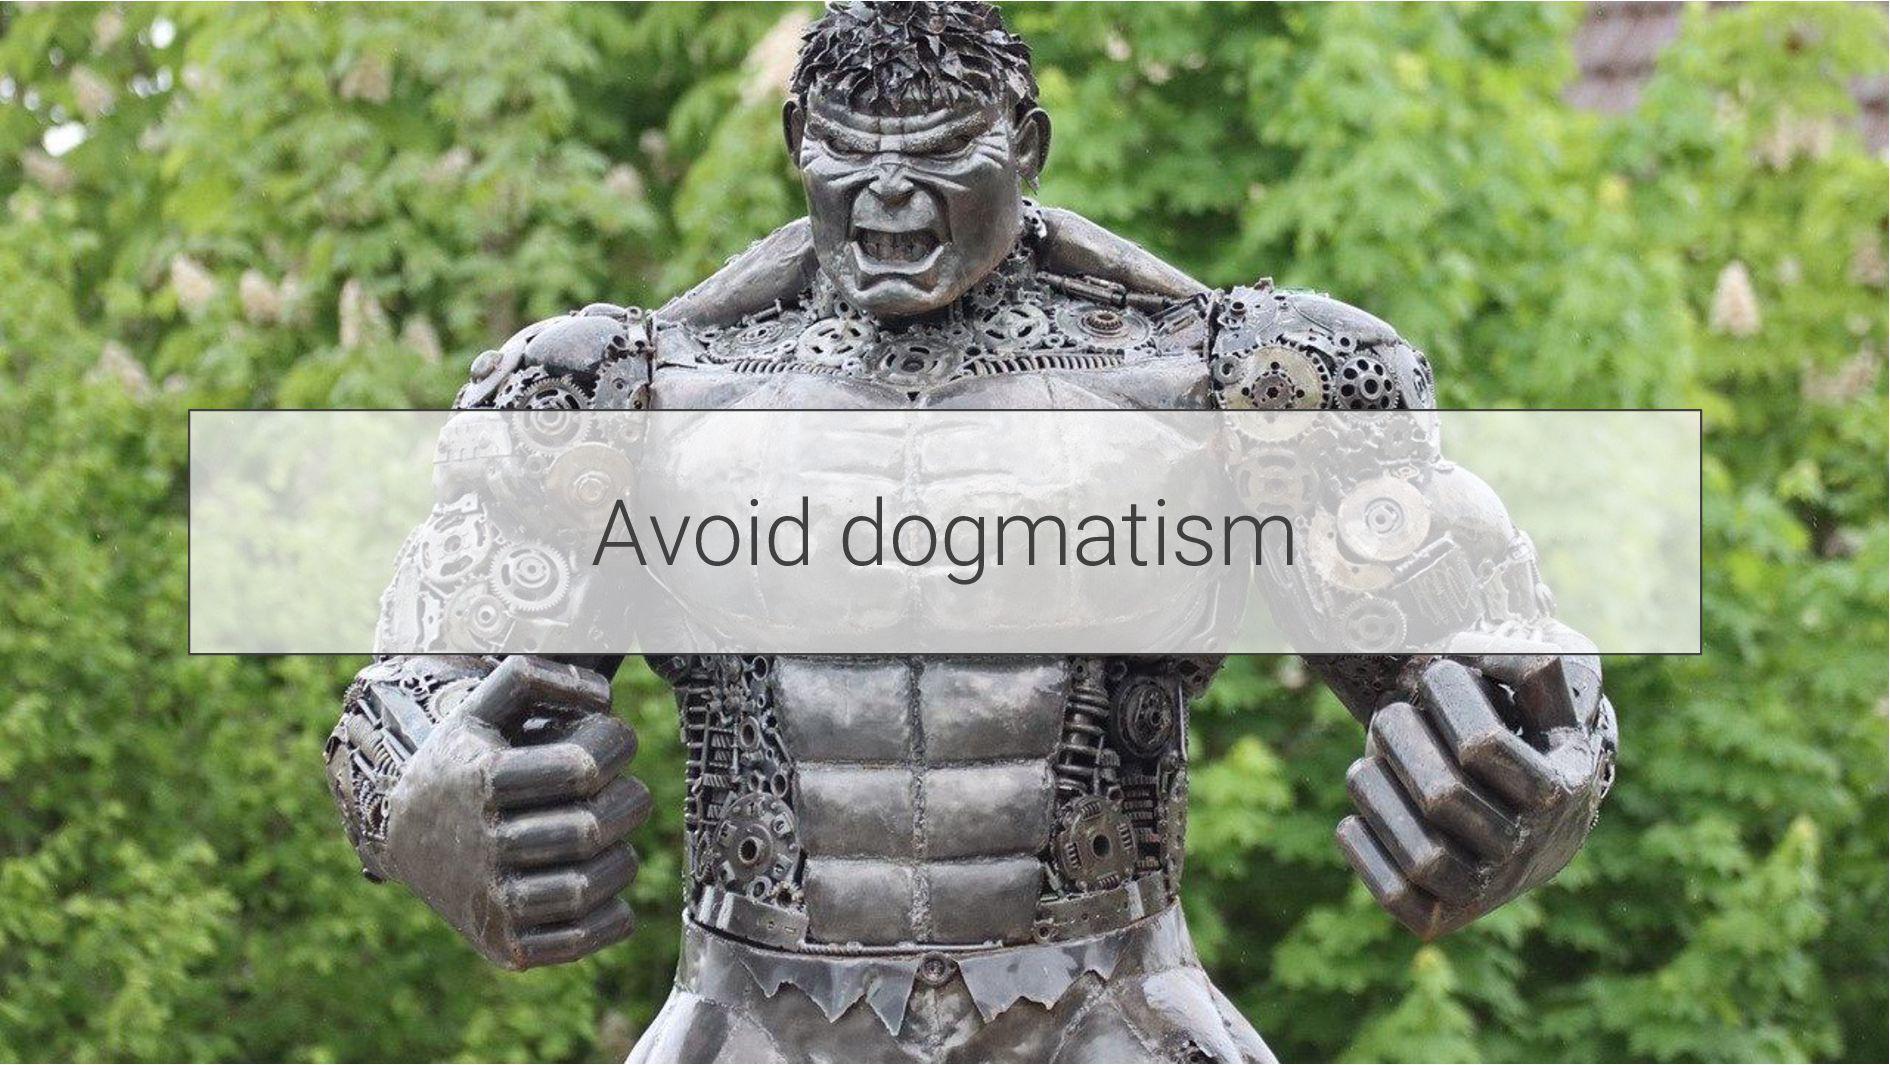 Avoid dogmatism